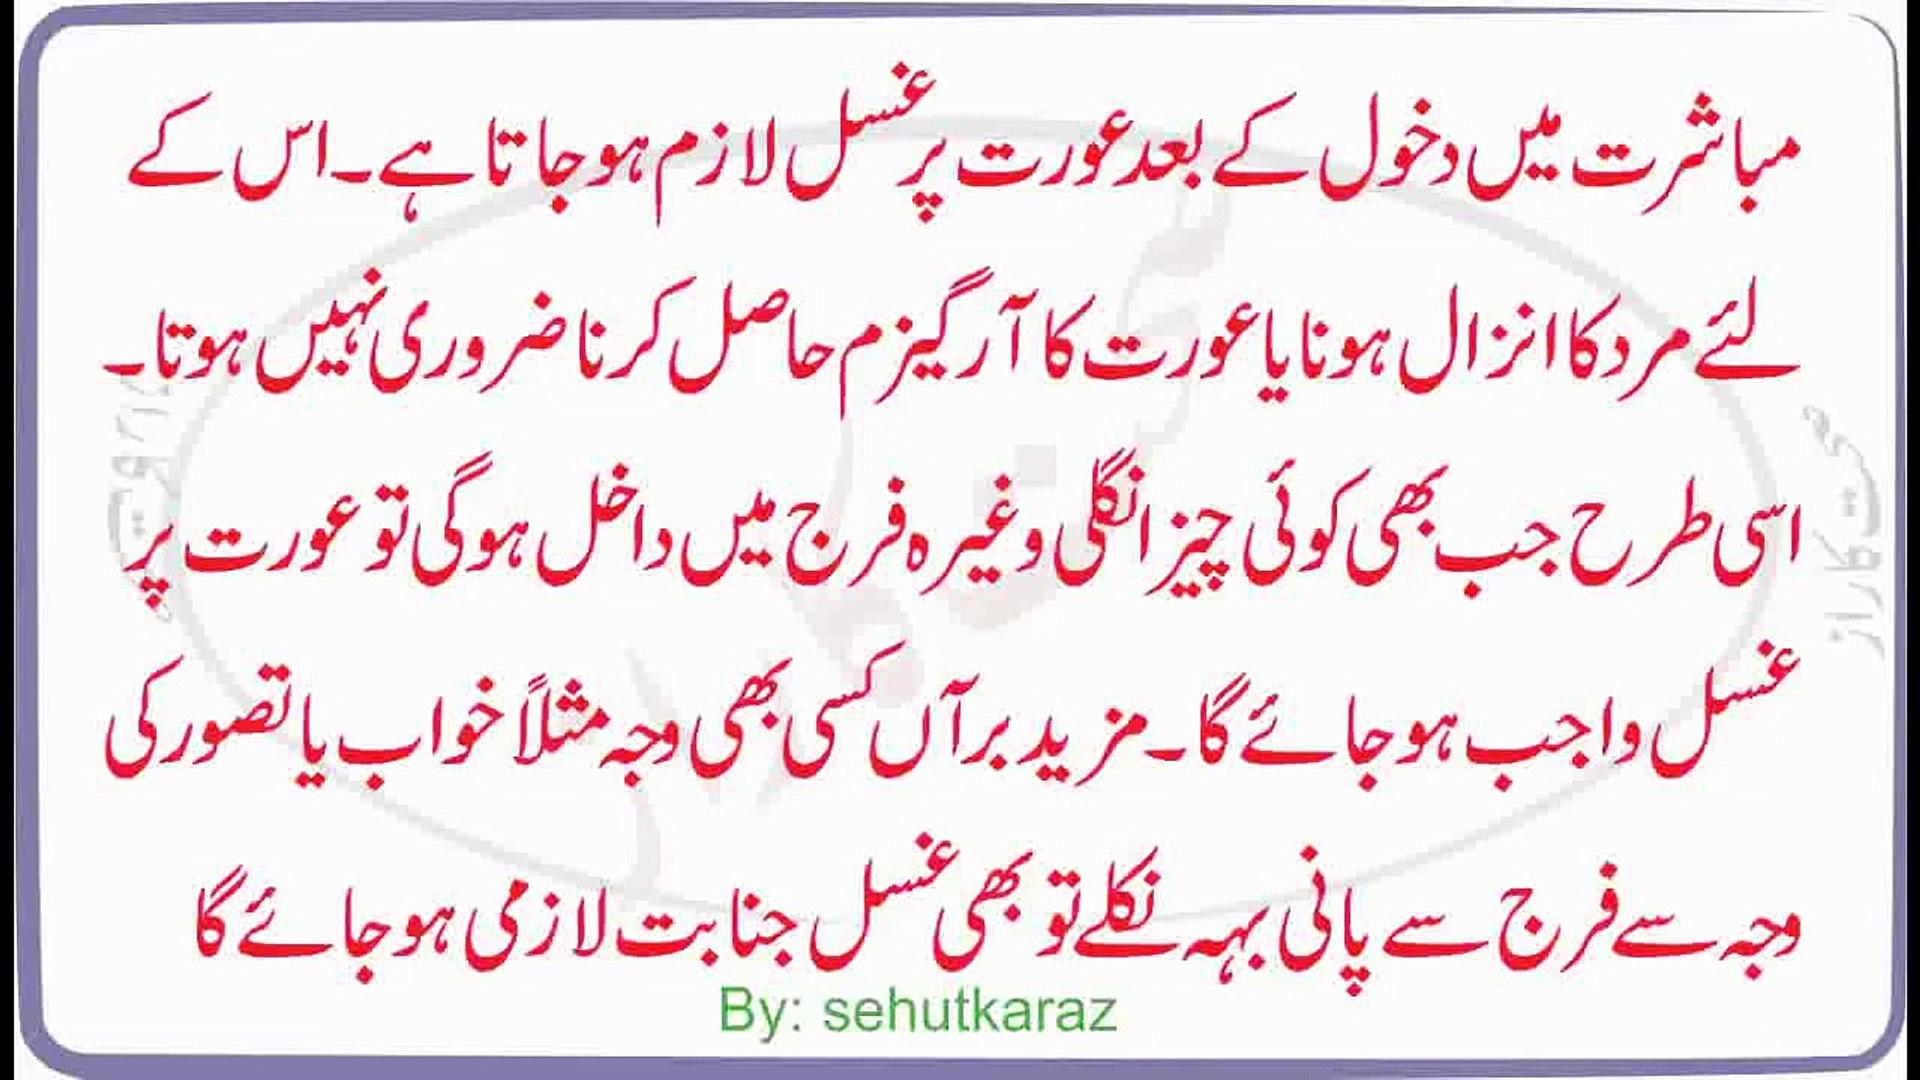 ghusl e janabat ka tariqa in urdu Ghusal ka tarika for women in Urduغسل  جنابت کا طریقہ